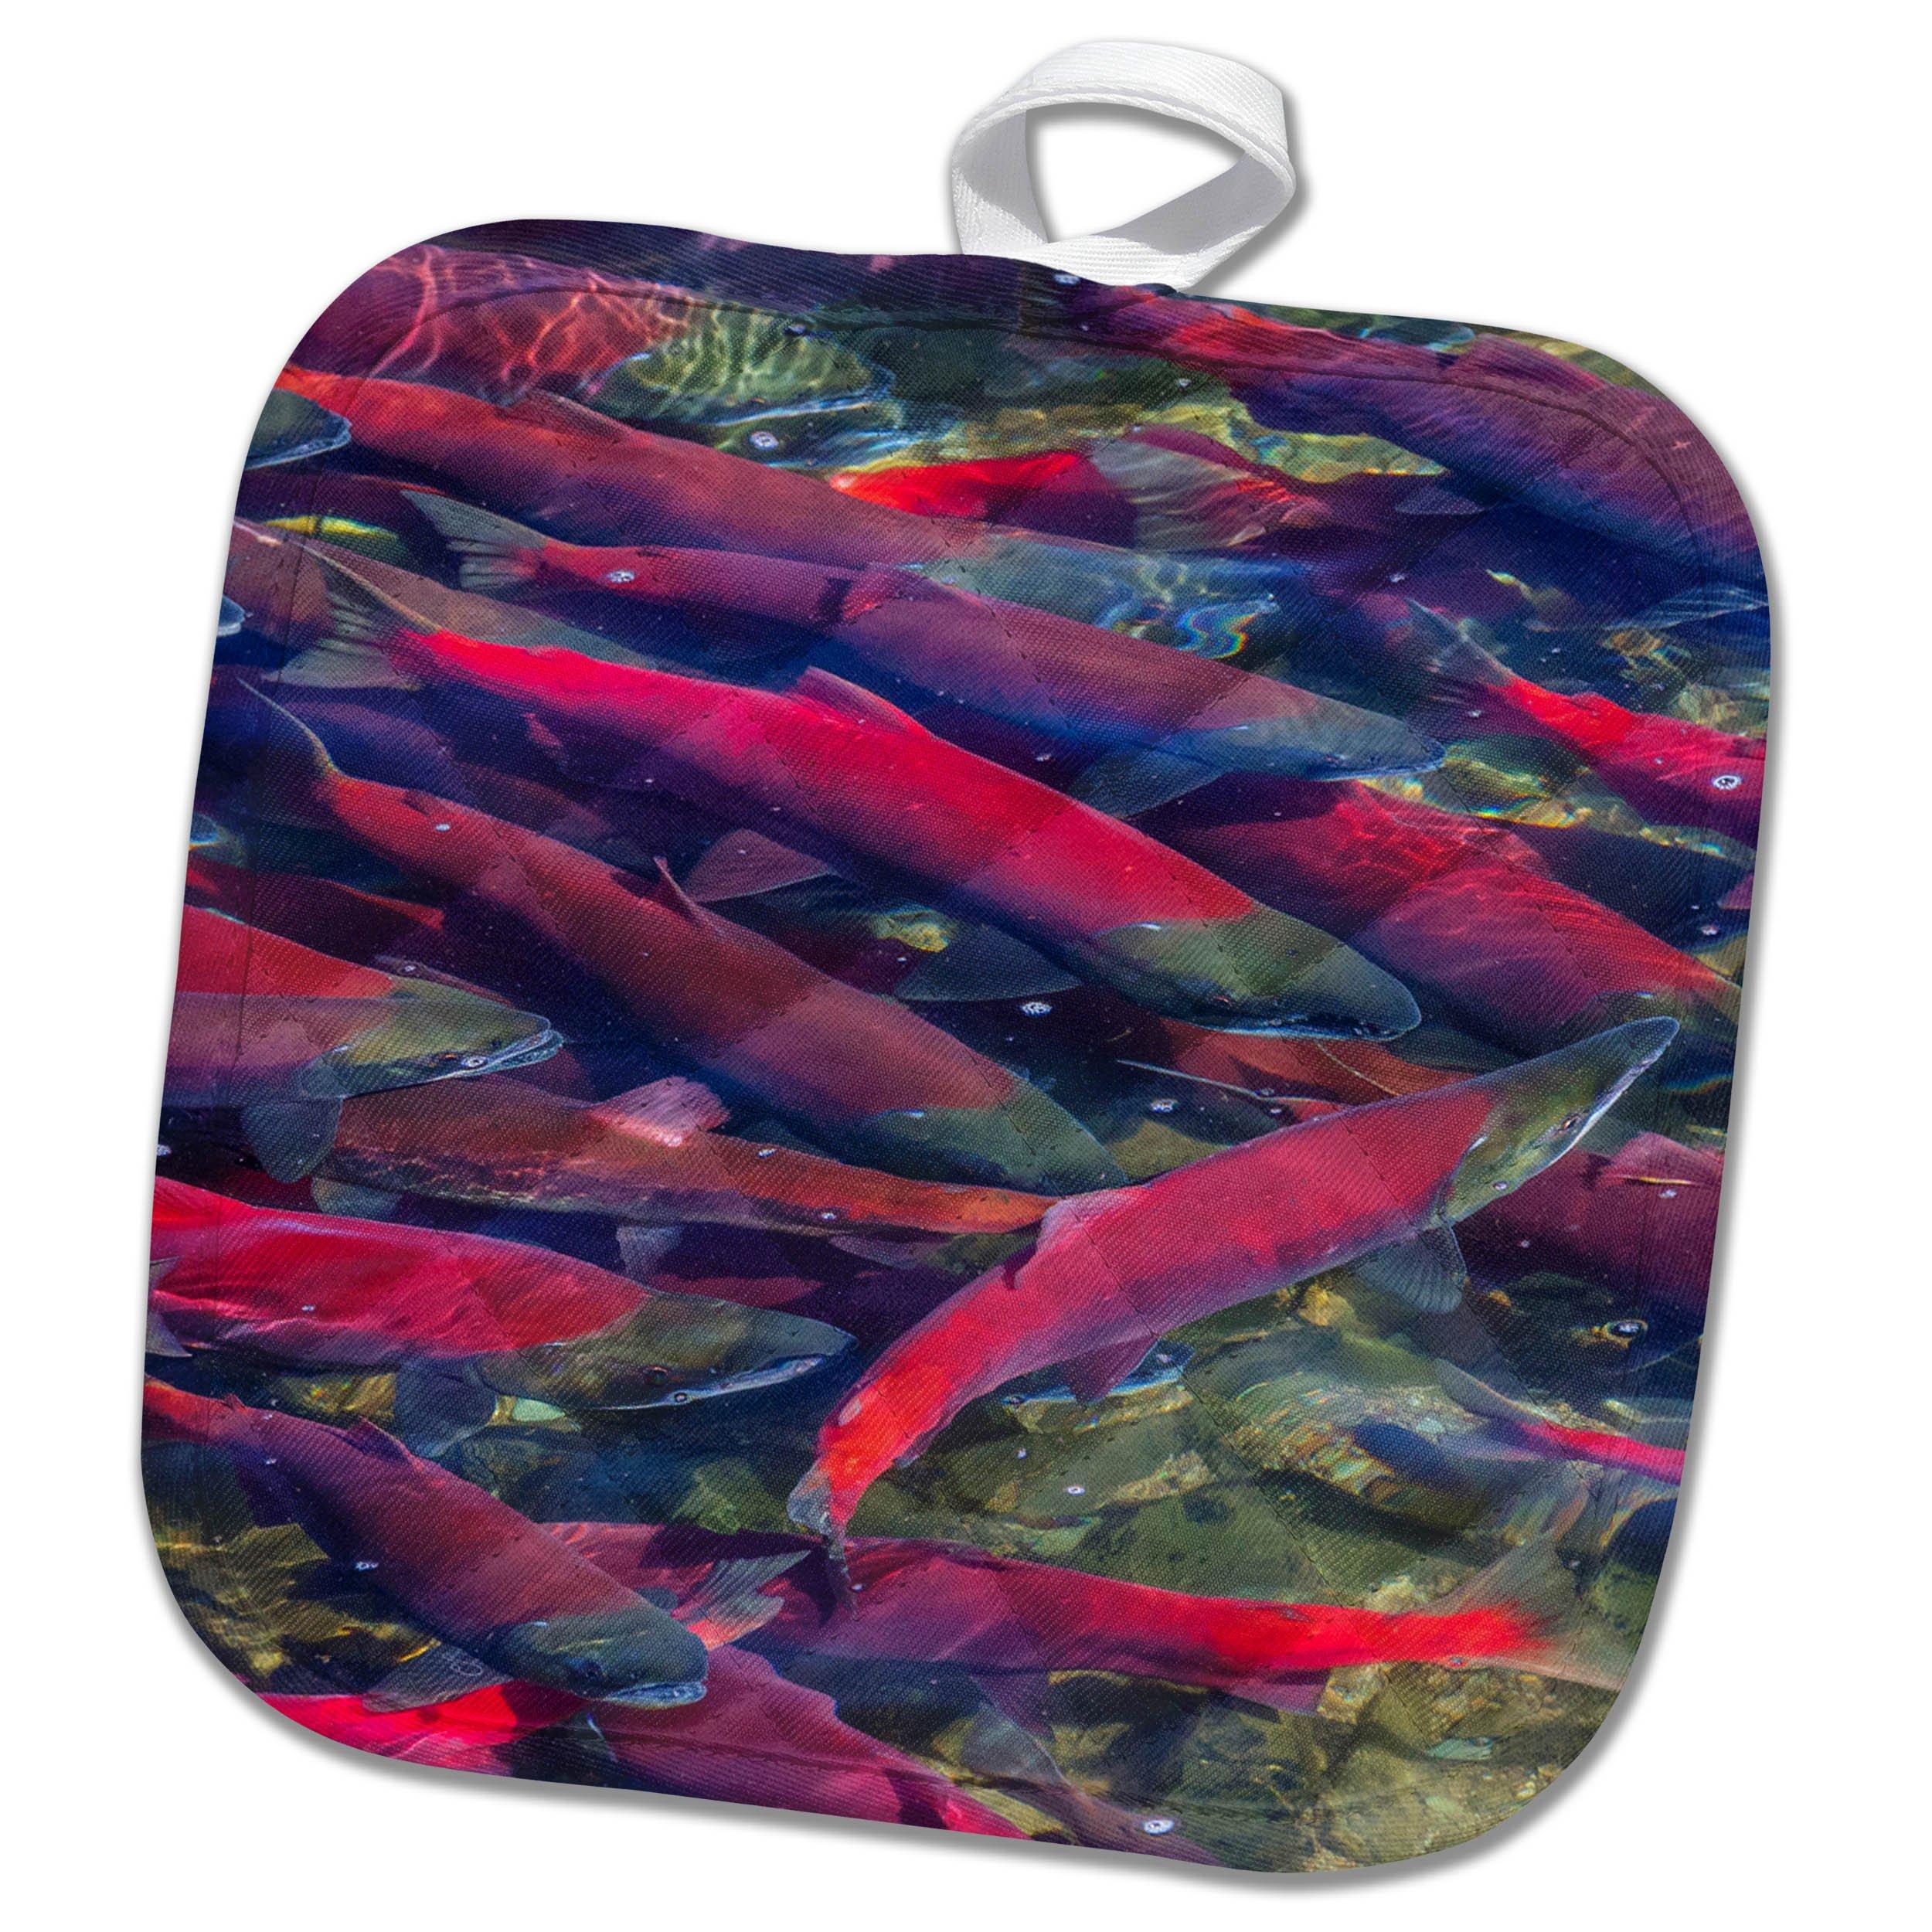 3dRose Danita Delimont - Fish - Migrating sockeye salmon, Katmai National Park, Alaska, USA - 8x8 Potholder (phl_278330_1)